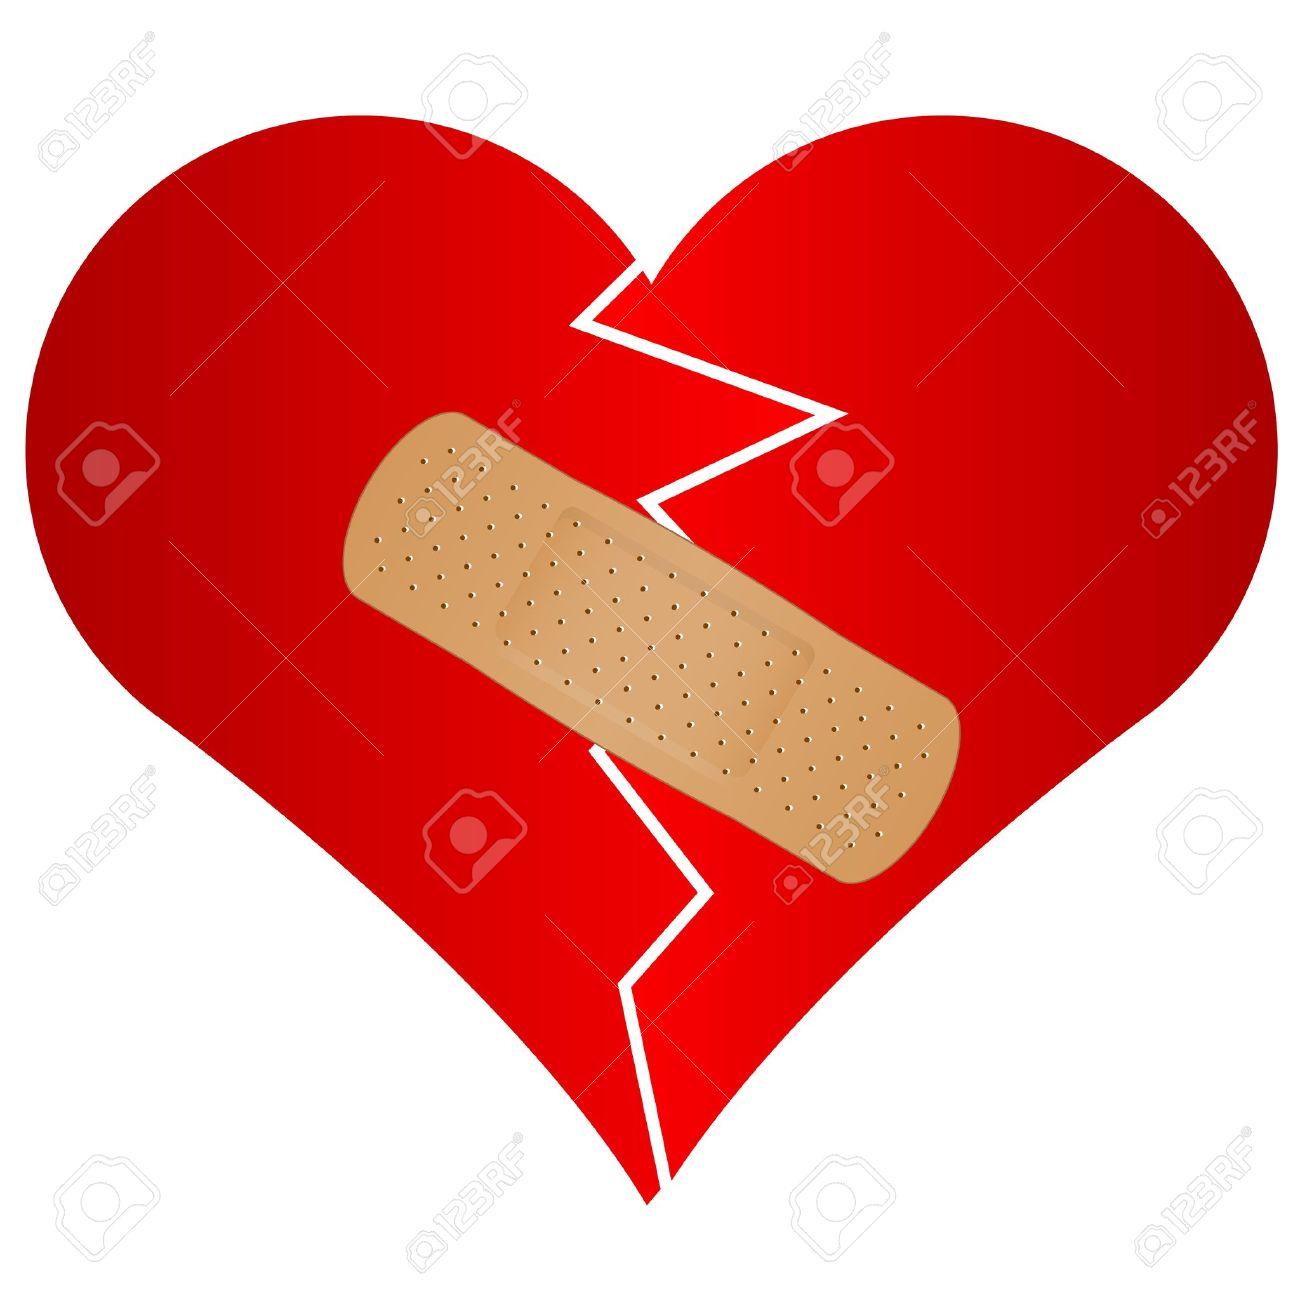 Vector illustration of broken heart with plaster Stock Vector - 13715766